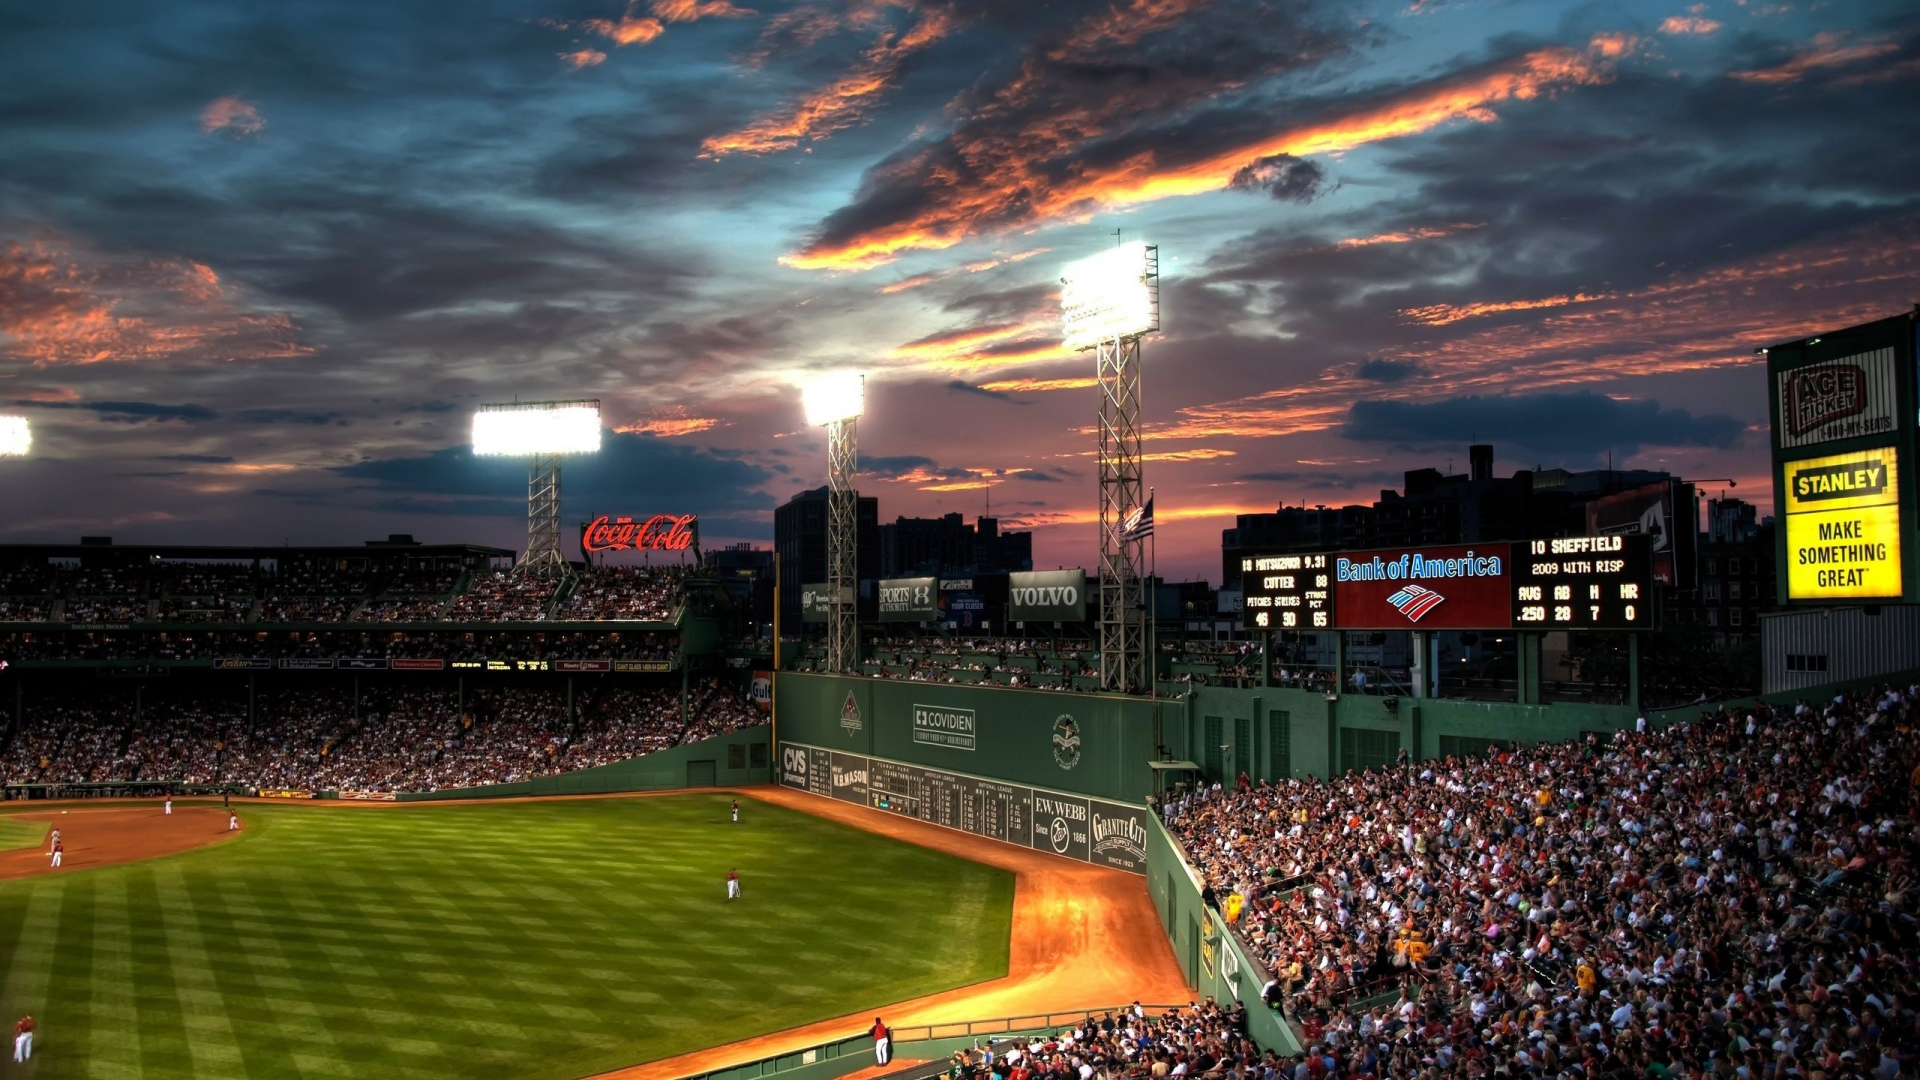 http://3.bp.blogspot.com/-UwBYocQUqN4/UG3OC3fQerI/AAAAAAAABtg/cZHMXoRd12A/s1920/baseball-fenway-park-1920x1080-wallpaper-6791.jpg